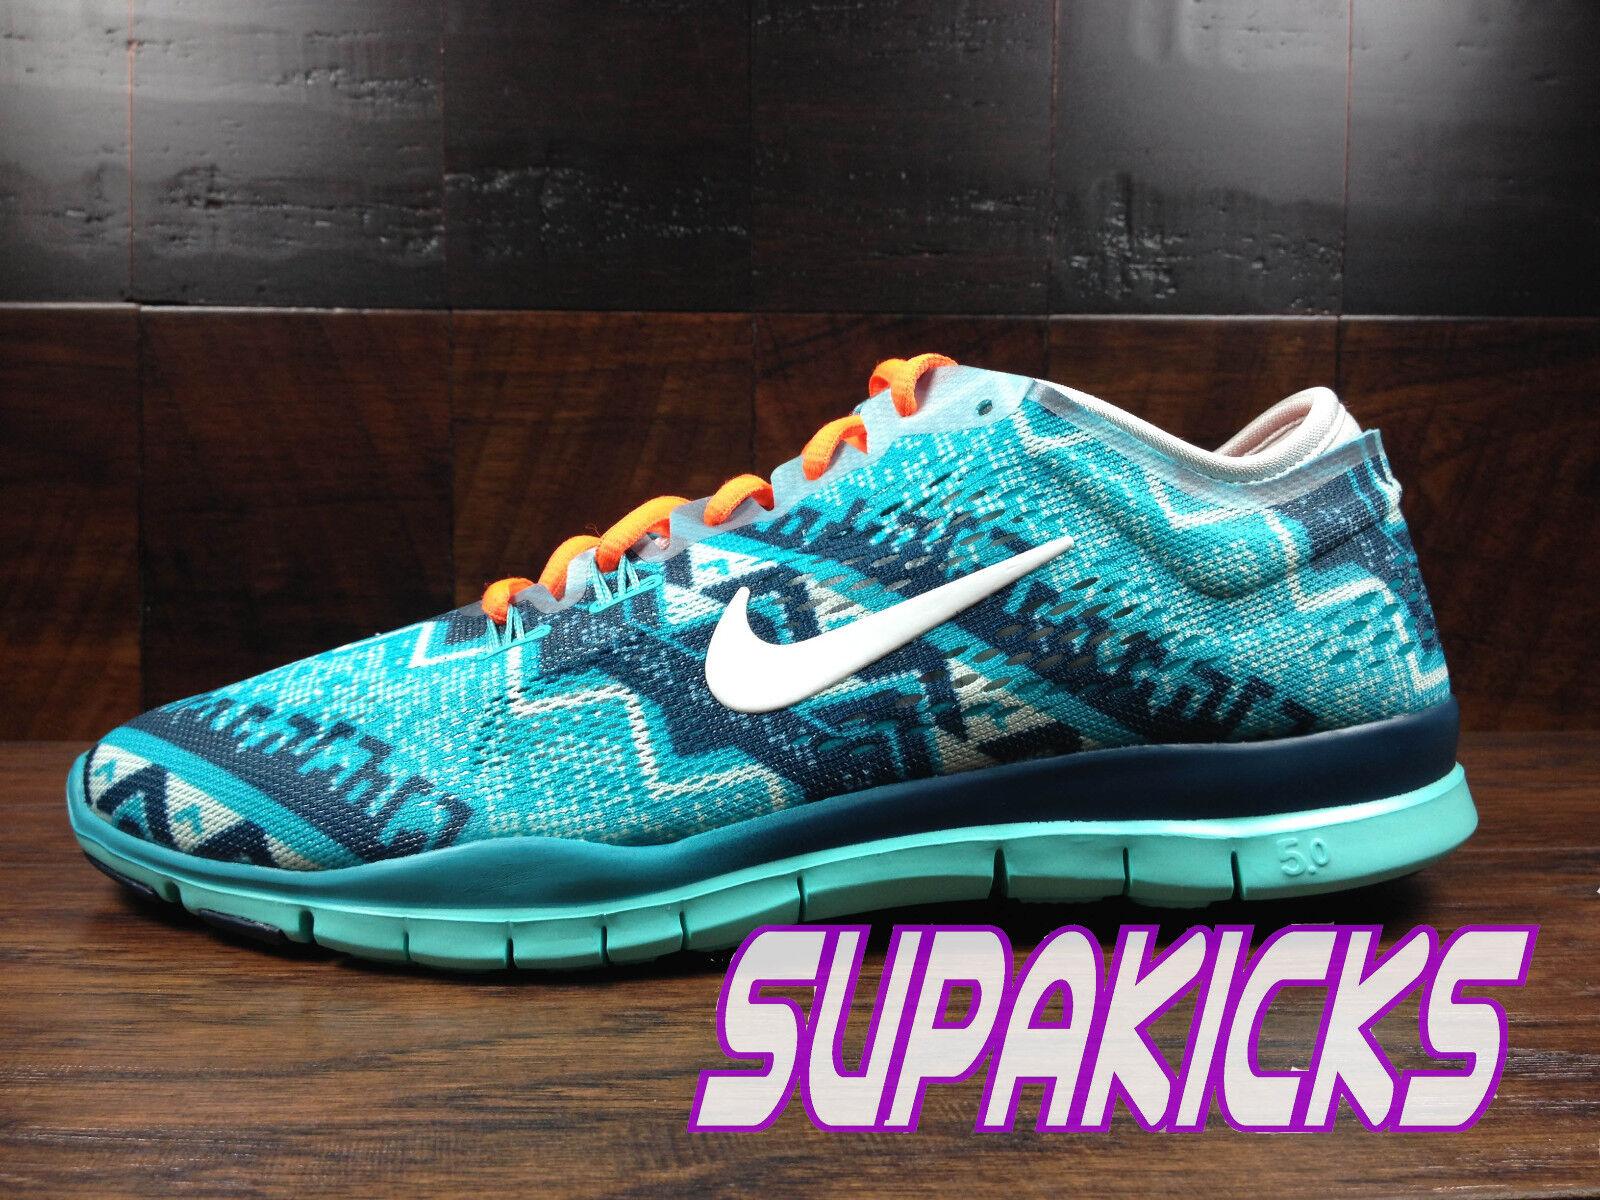 Nike Free 5.0 TR 4 FIT 4 TR Mujer (Luz Fresno/carmesí/azul) Crossfit [629832-009] bcad75